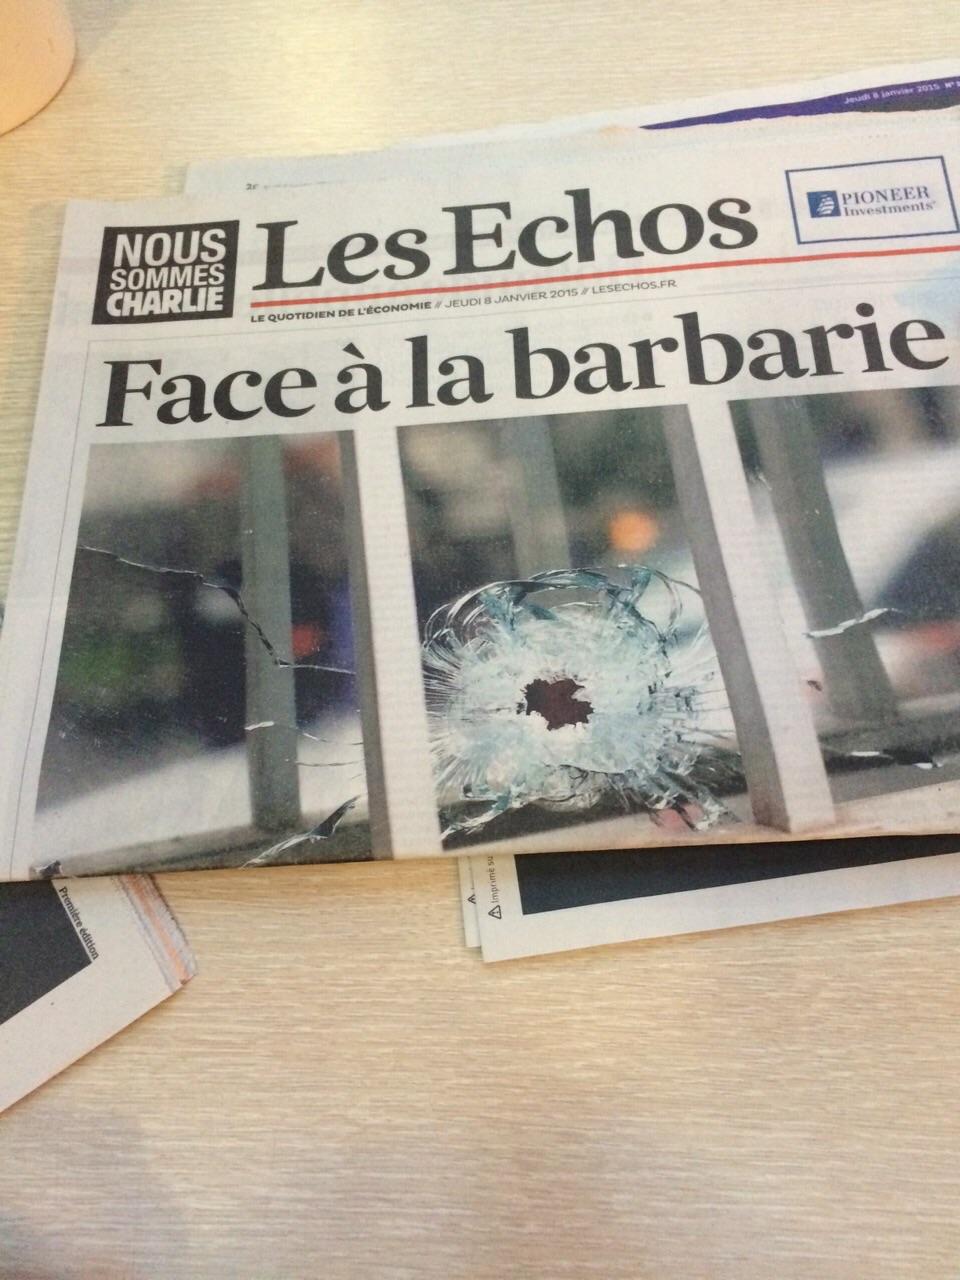 Les Echos z 8. ledna 2015